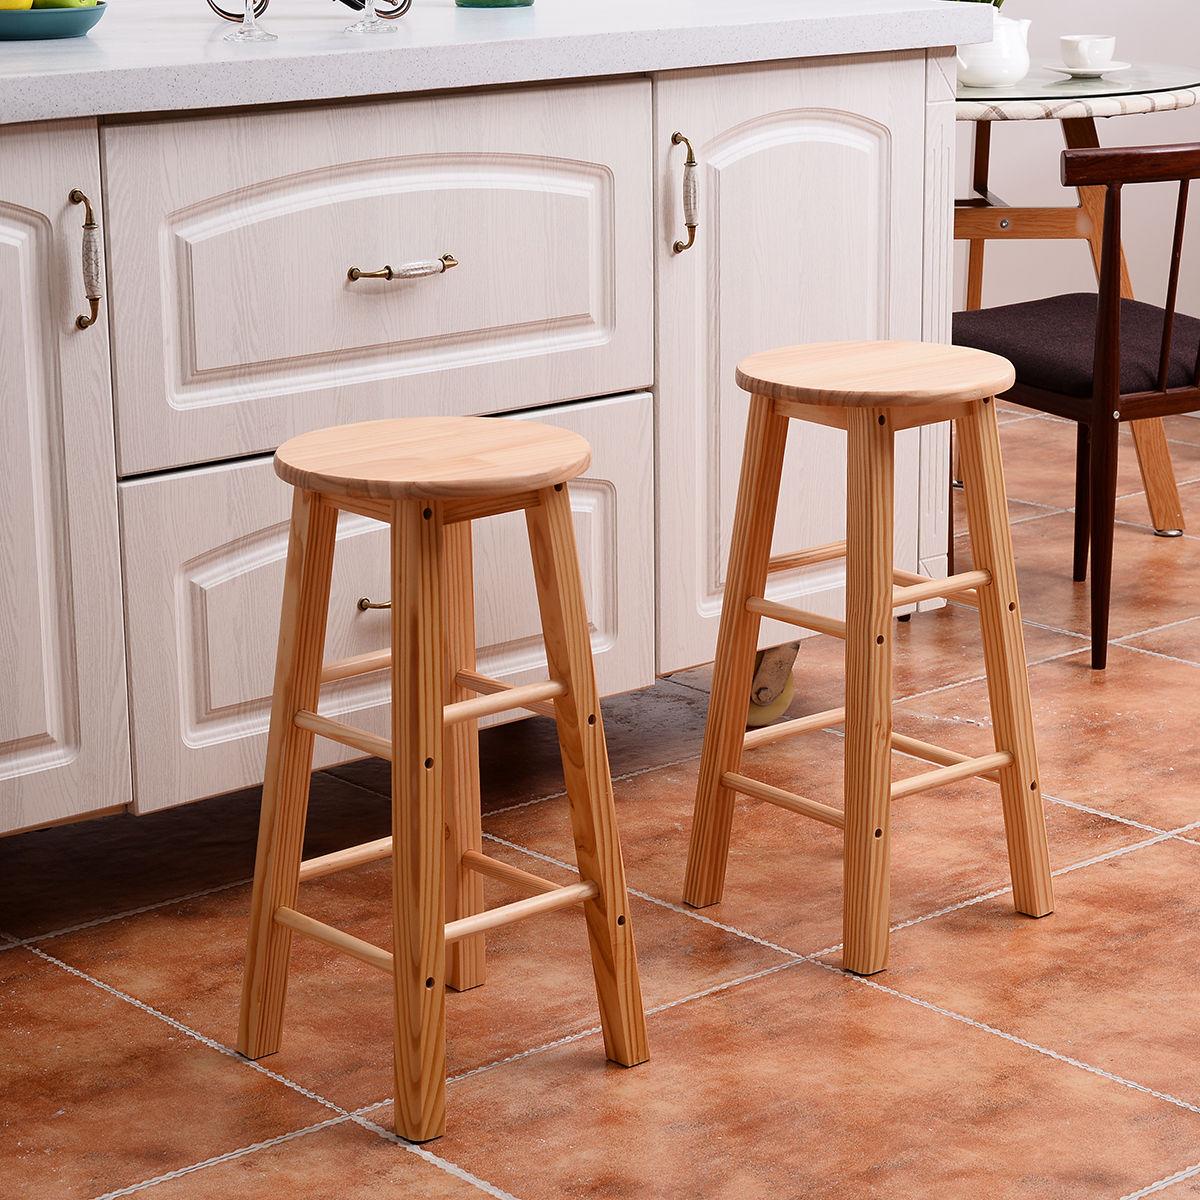 Set Of 2 Wood Counter Stools Bar Stools Dining Kitchen